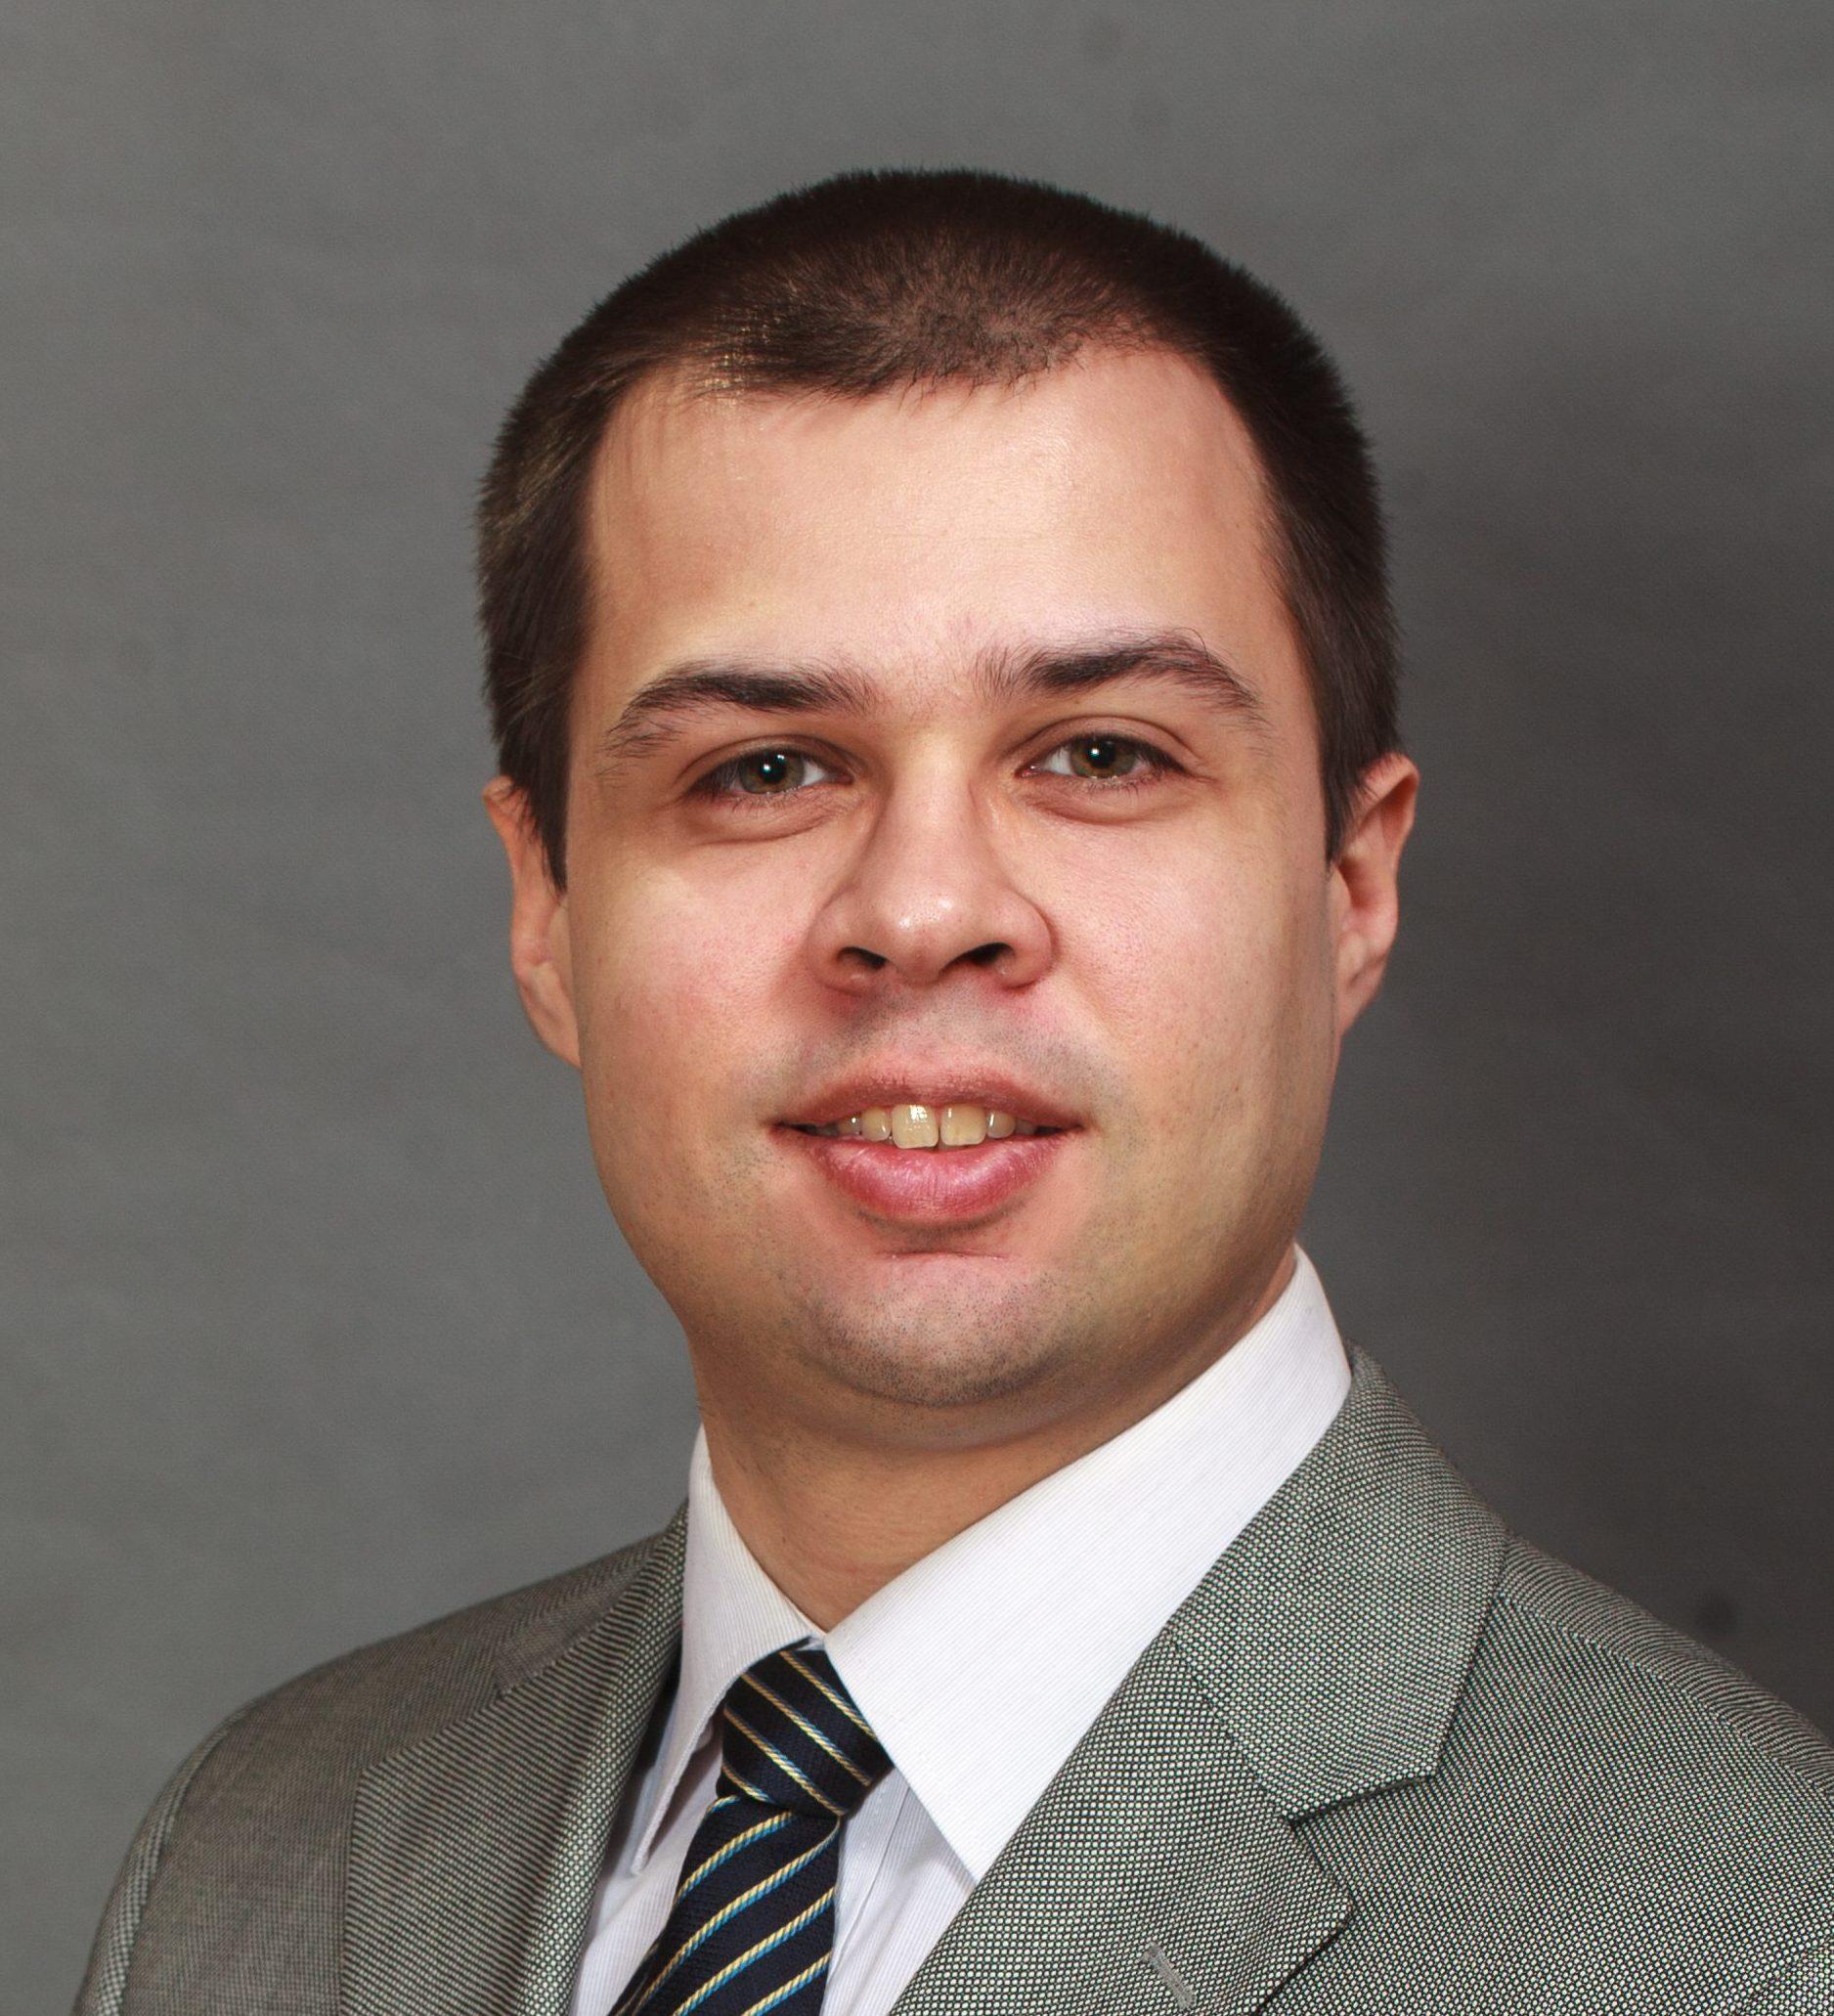 Водолазов Дмитрий Михайлович